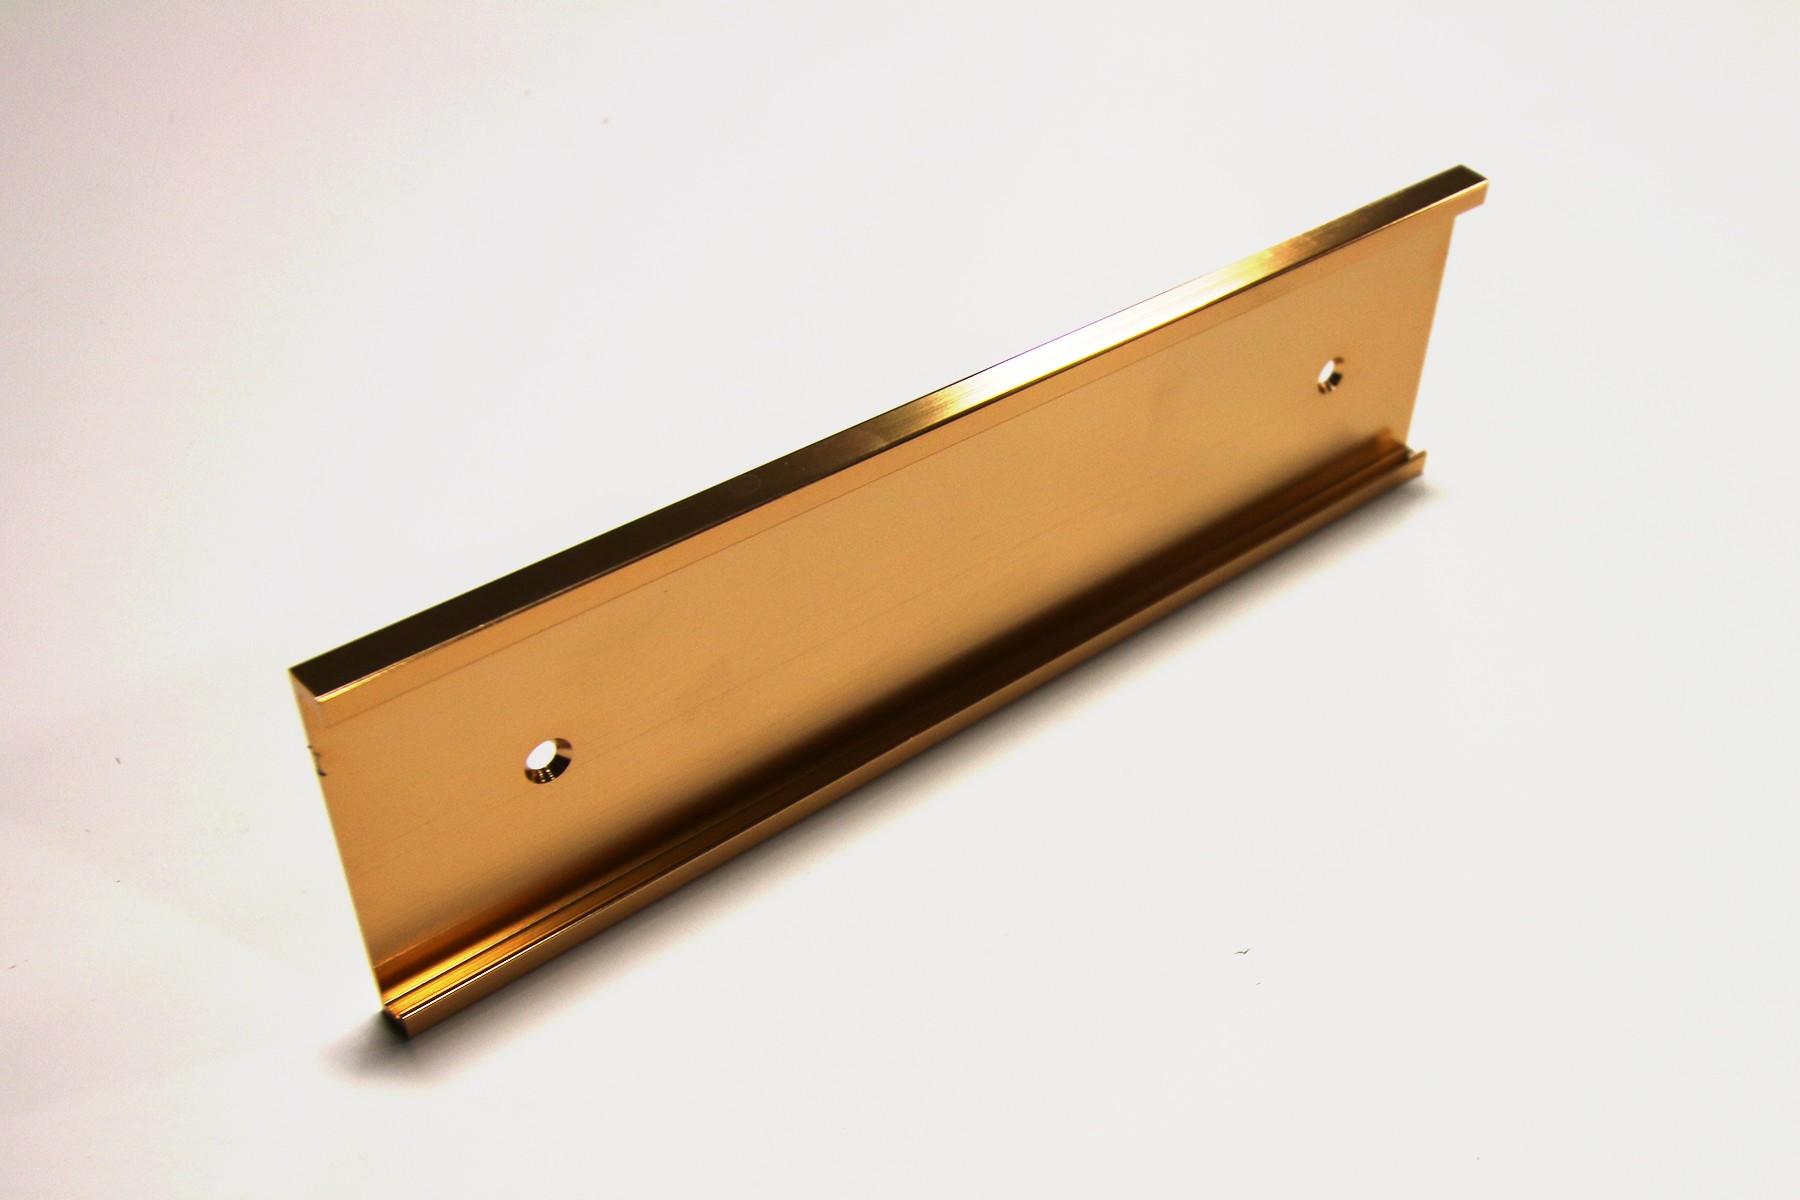 2 x 8 Wall Bracket (1/8), Gold